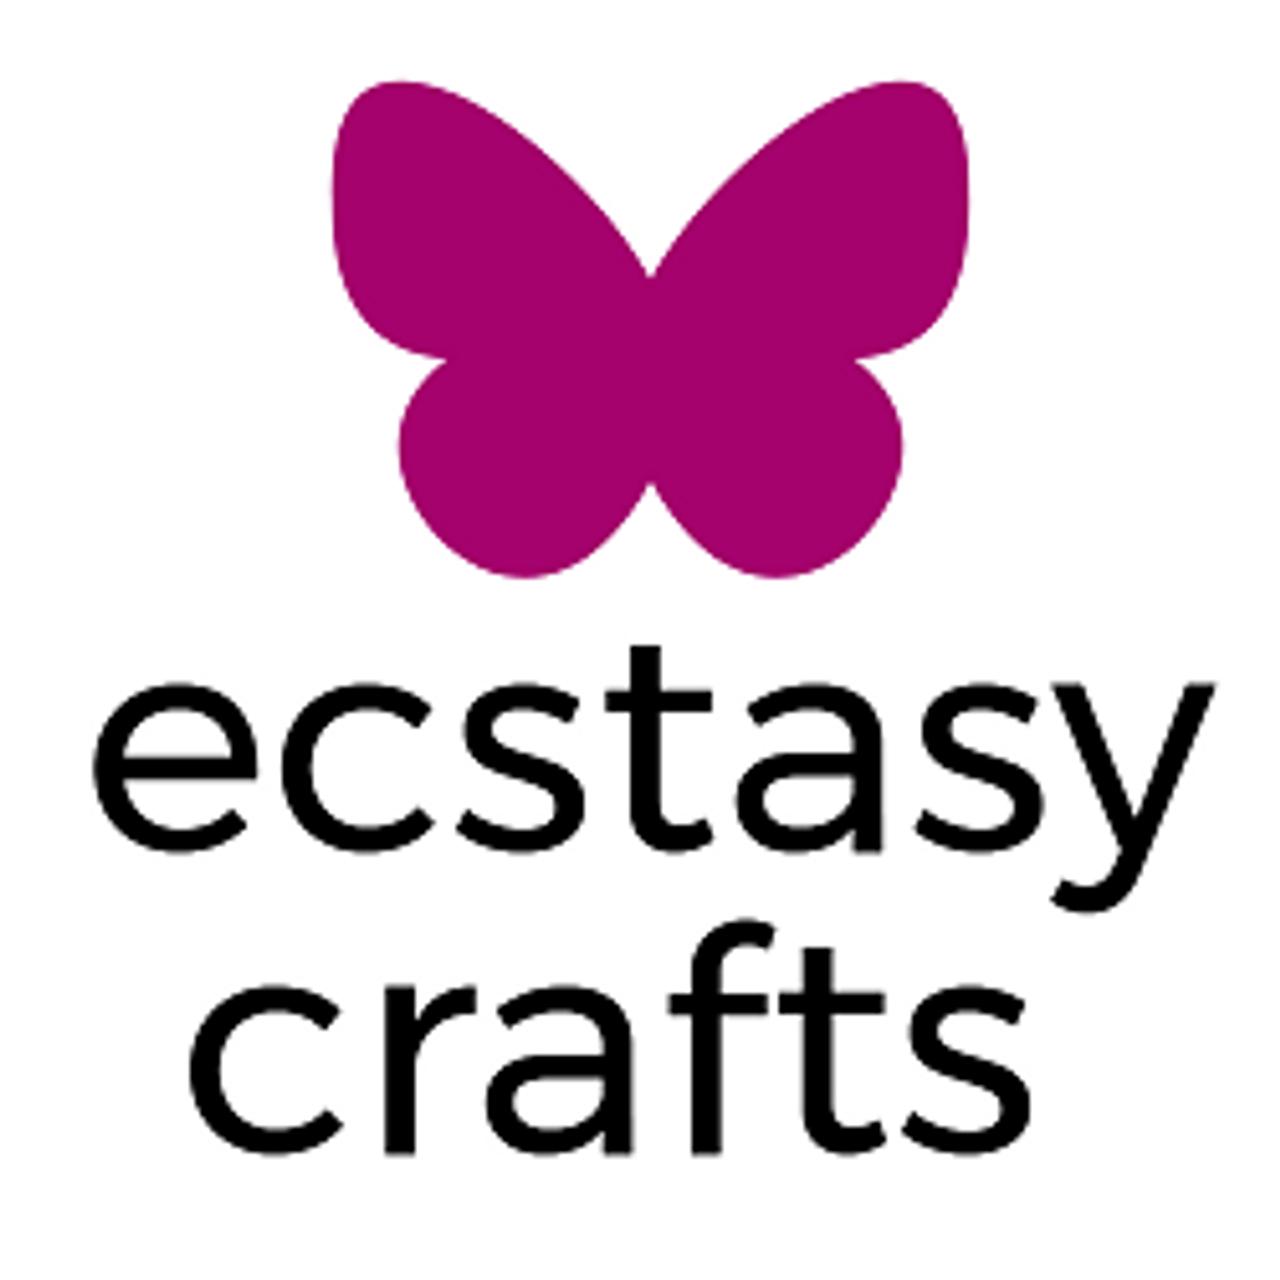 Ecstasy Crafts